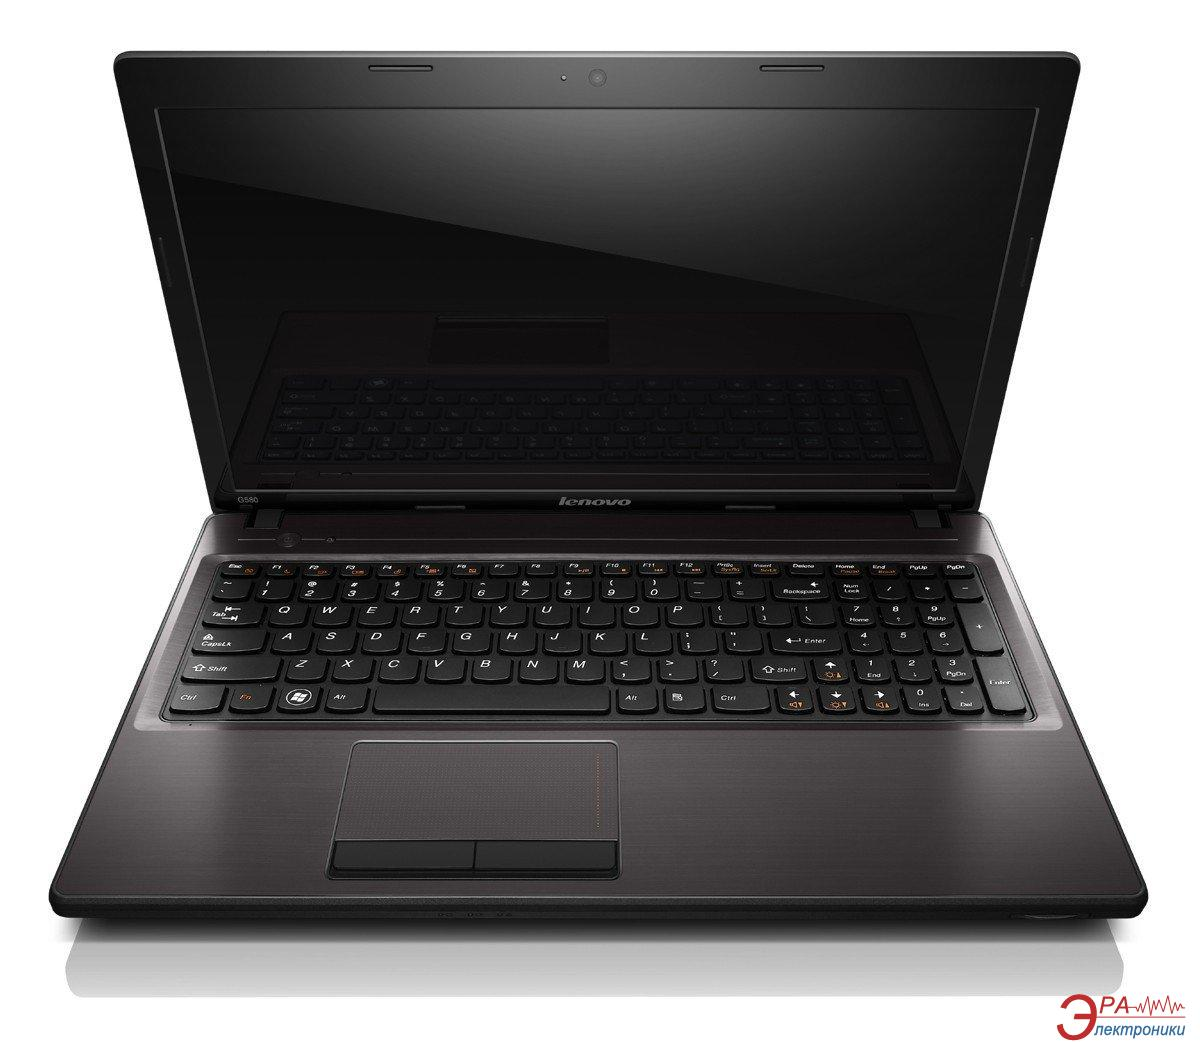 Ноутбук Lenovo IdeaPad G580AM (59-410806) Brown 15,6